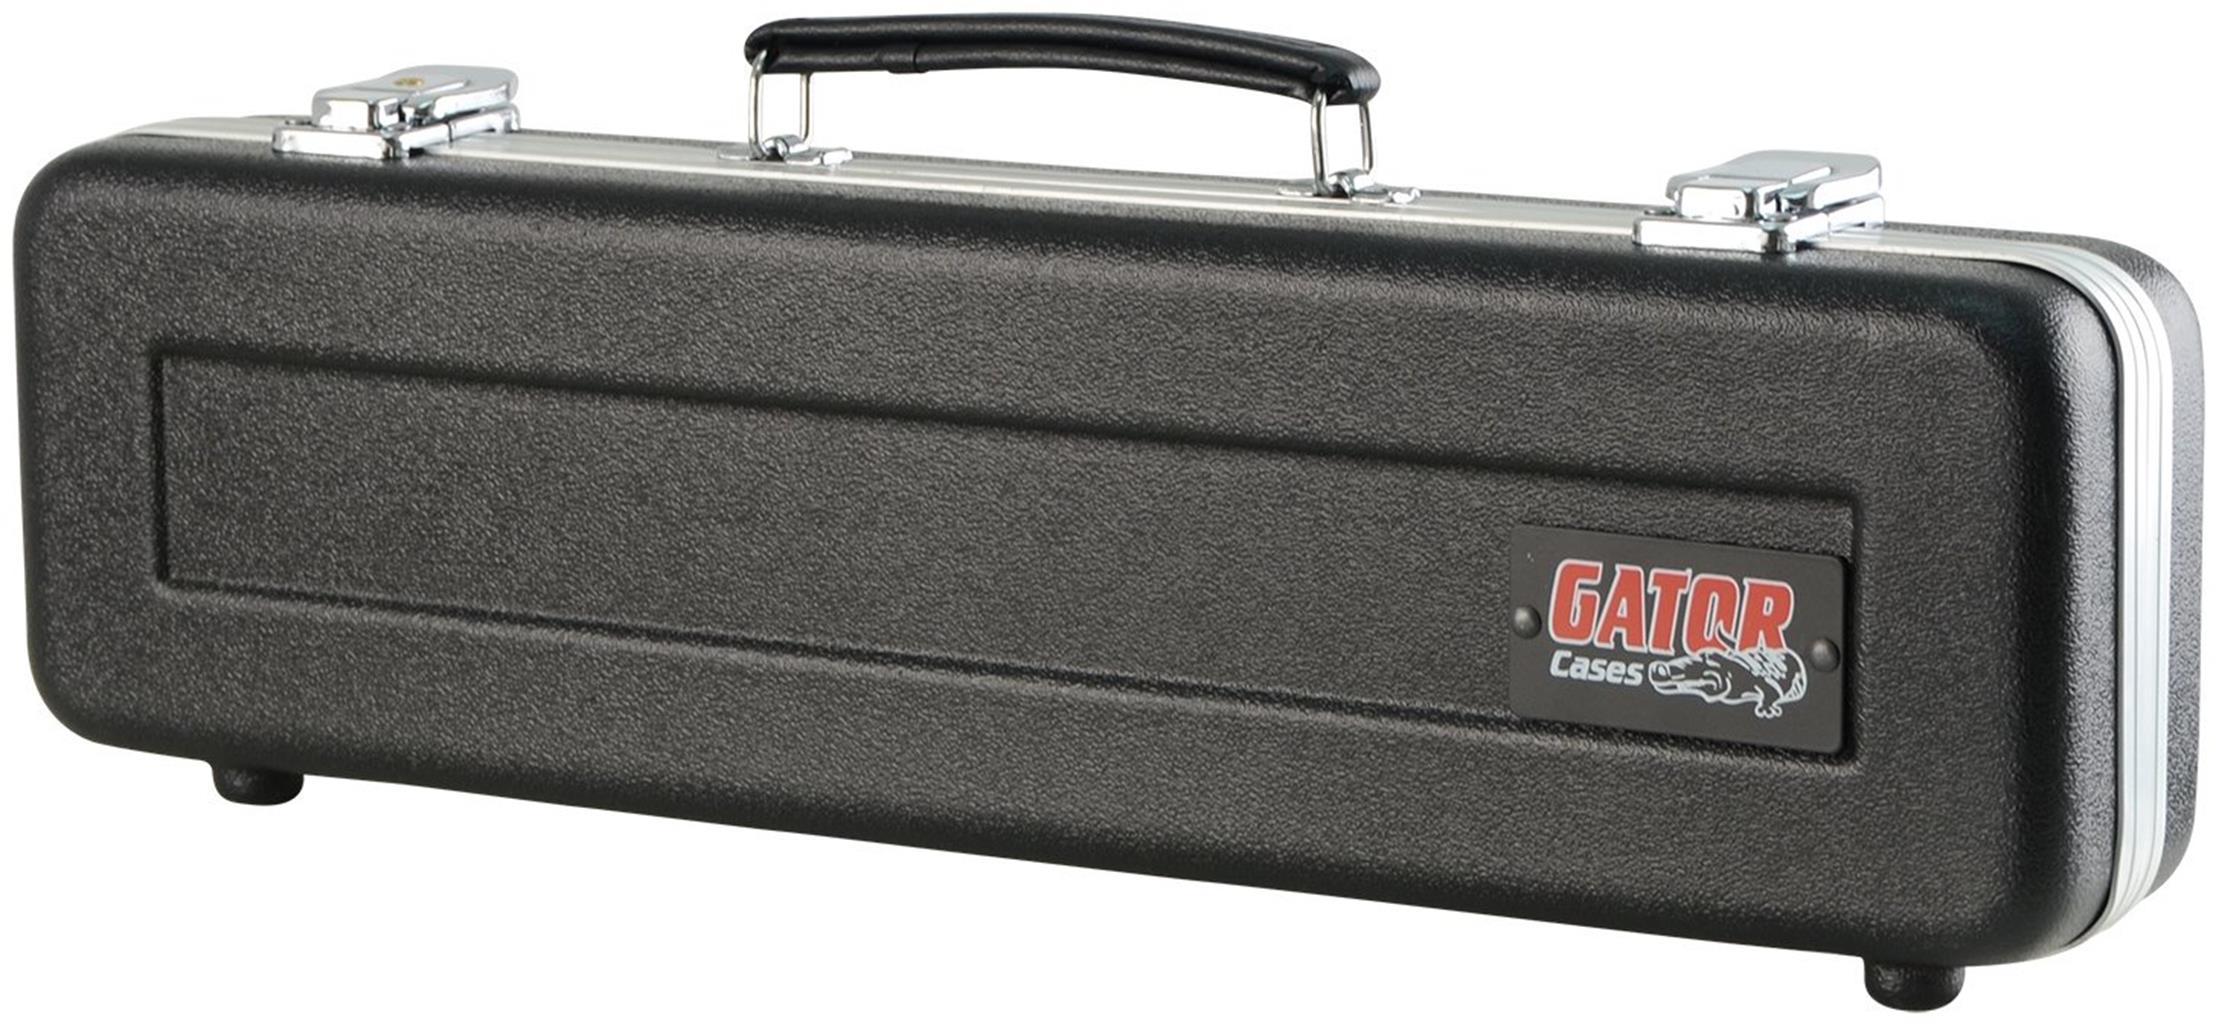 Gator-Cases-GC-FLUTE-B-C-astuccio-per-flauto-traverso-sku-2757726415016